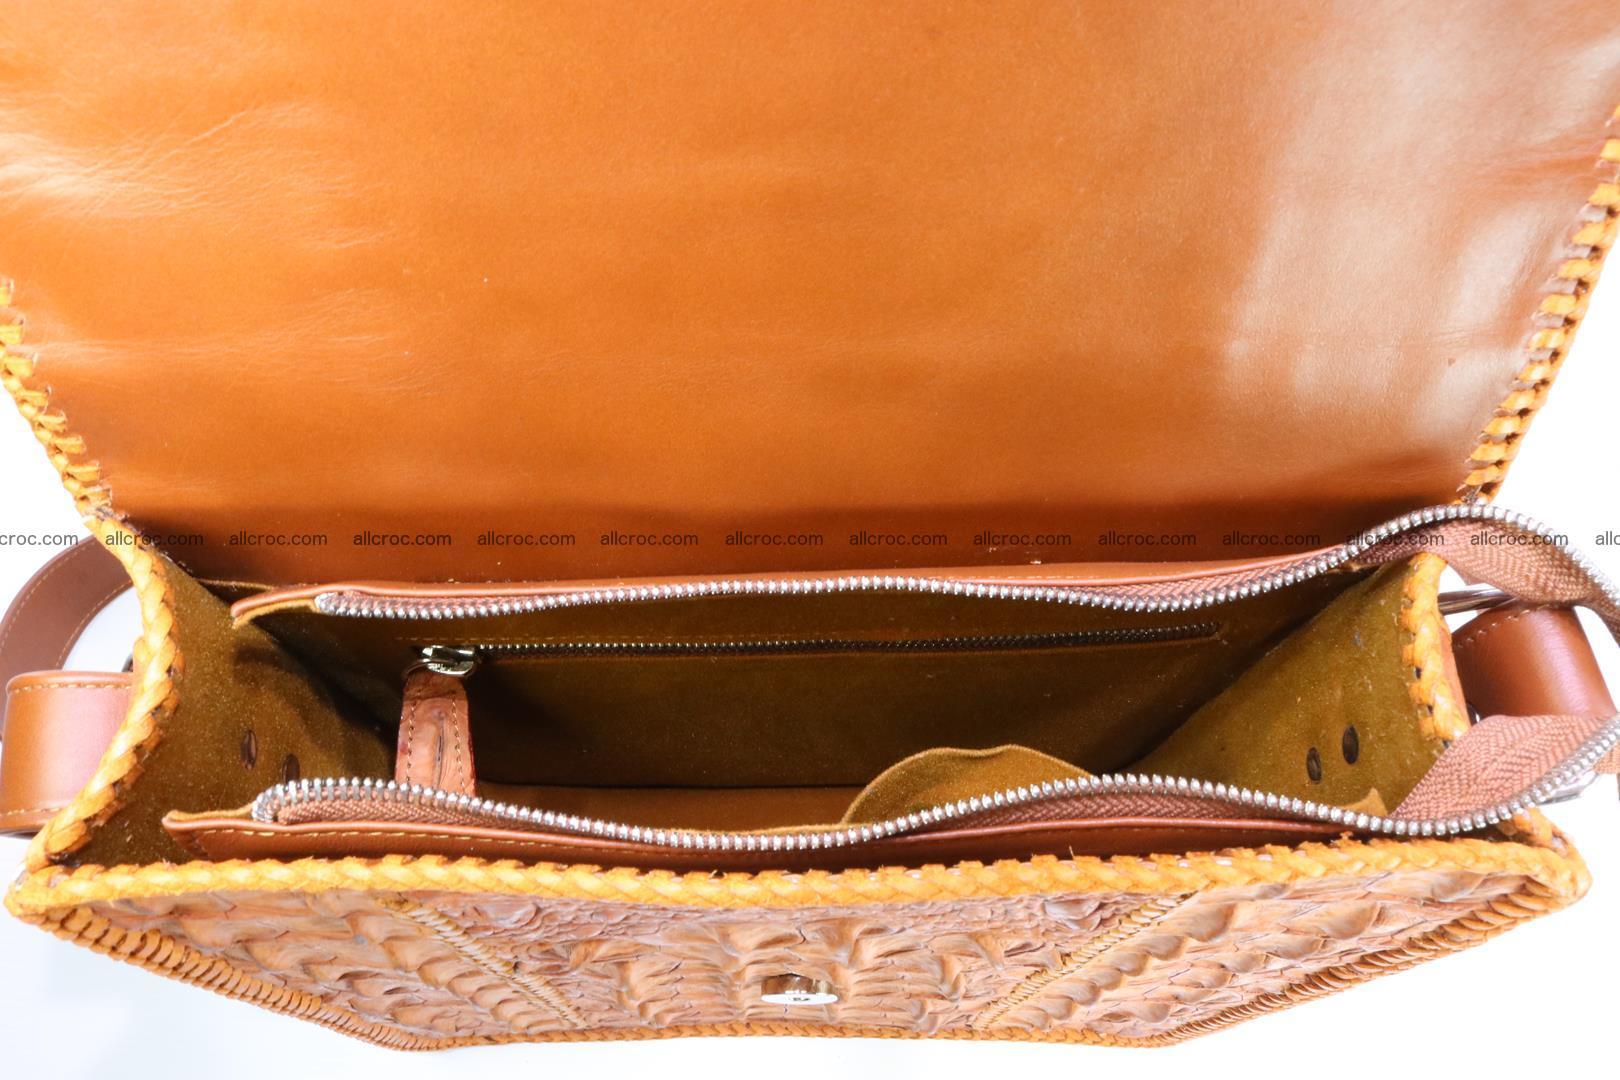 Сrocodile skin shoulder bag with braided edges 141 Foto 13